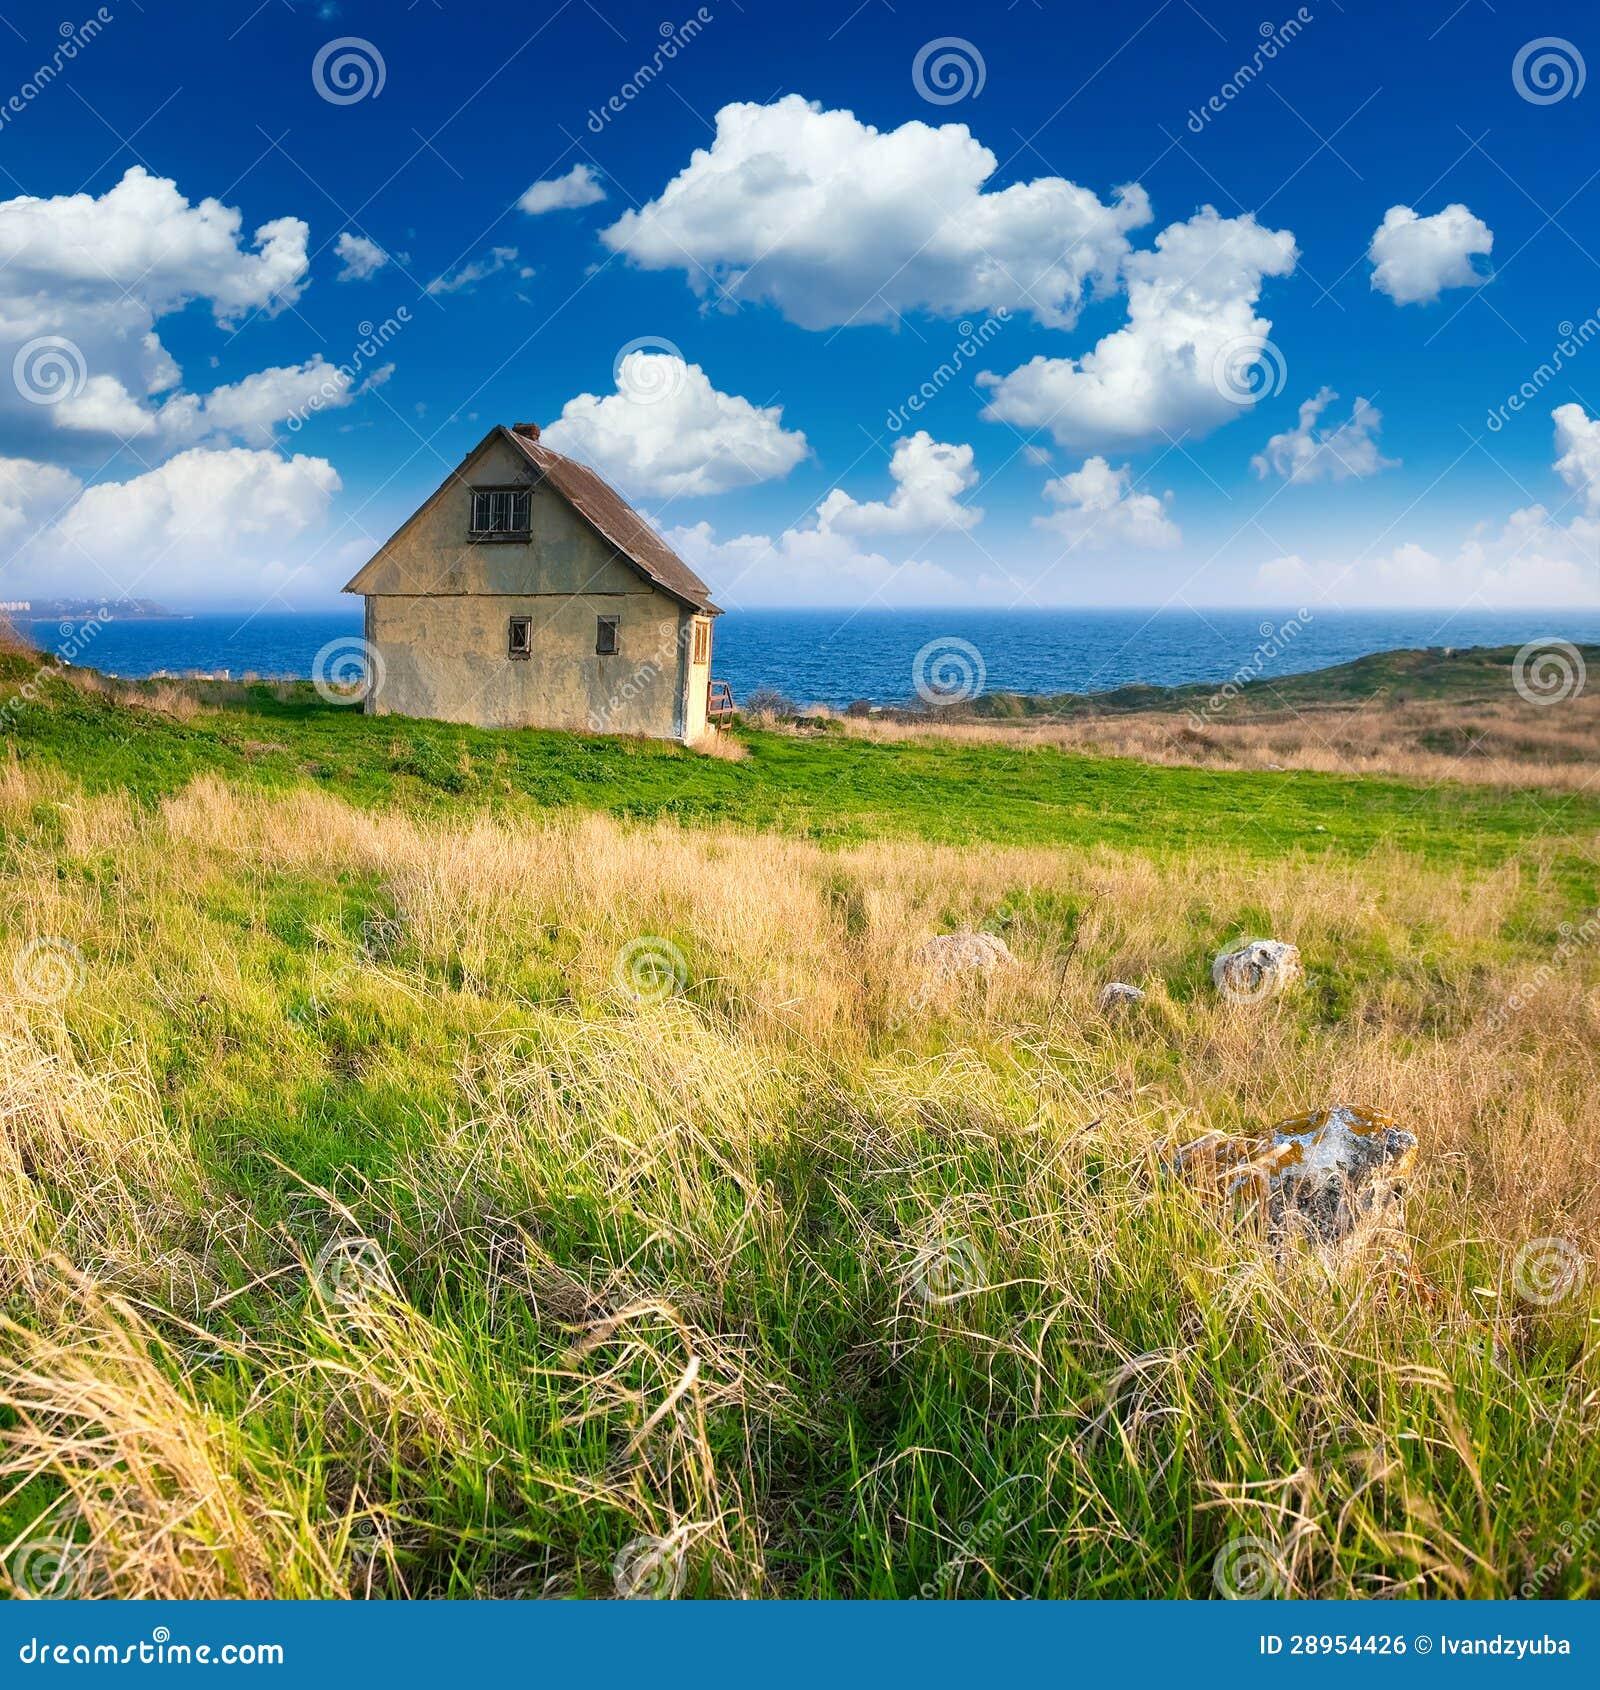 Stary mały dom nadmorski